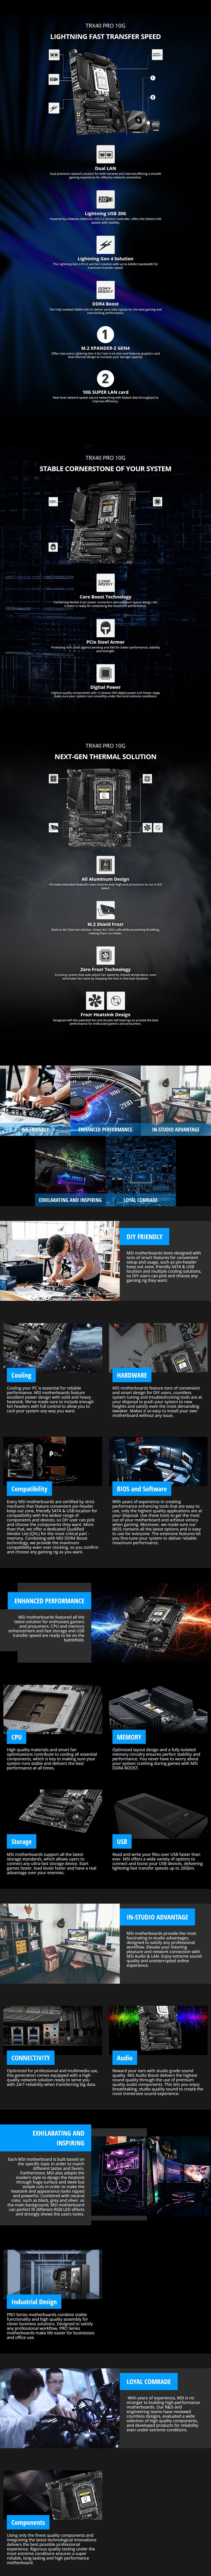 MSI TRX40 PRO 10G sTRX4 ATX Motherboard - Overview 1